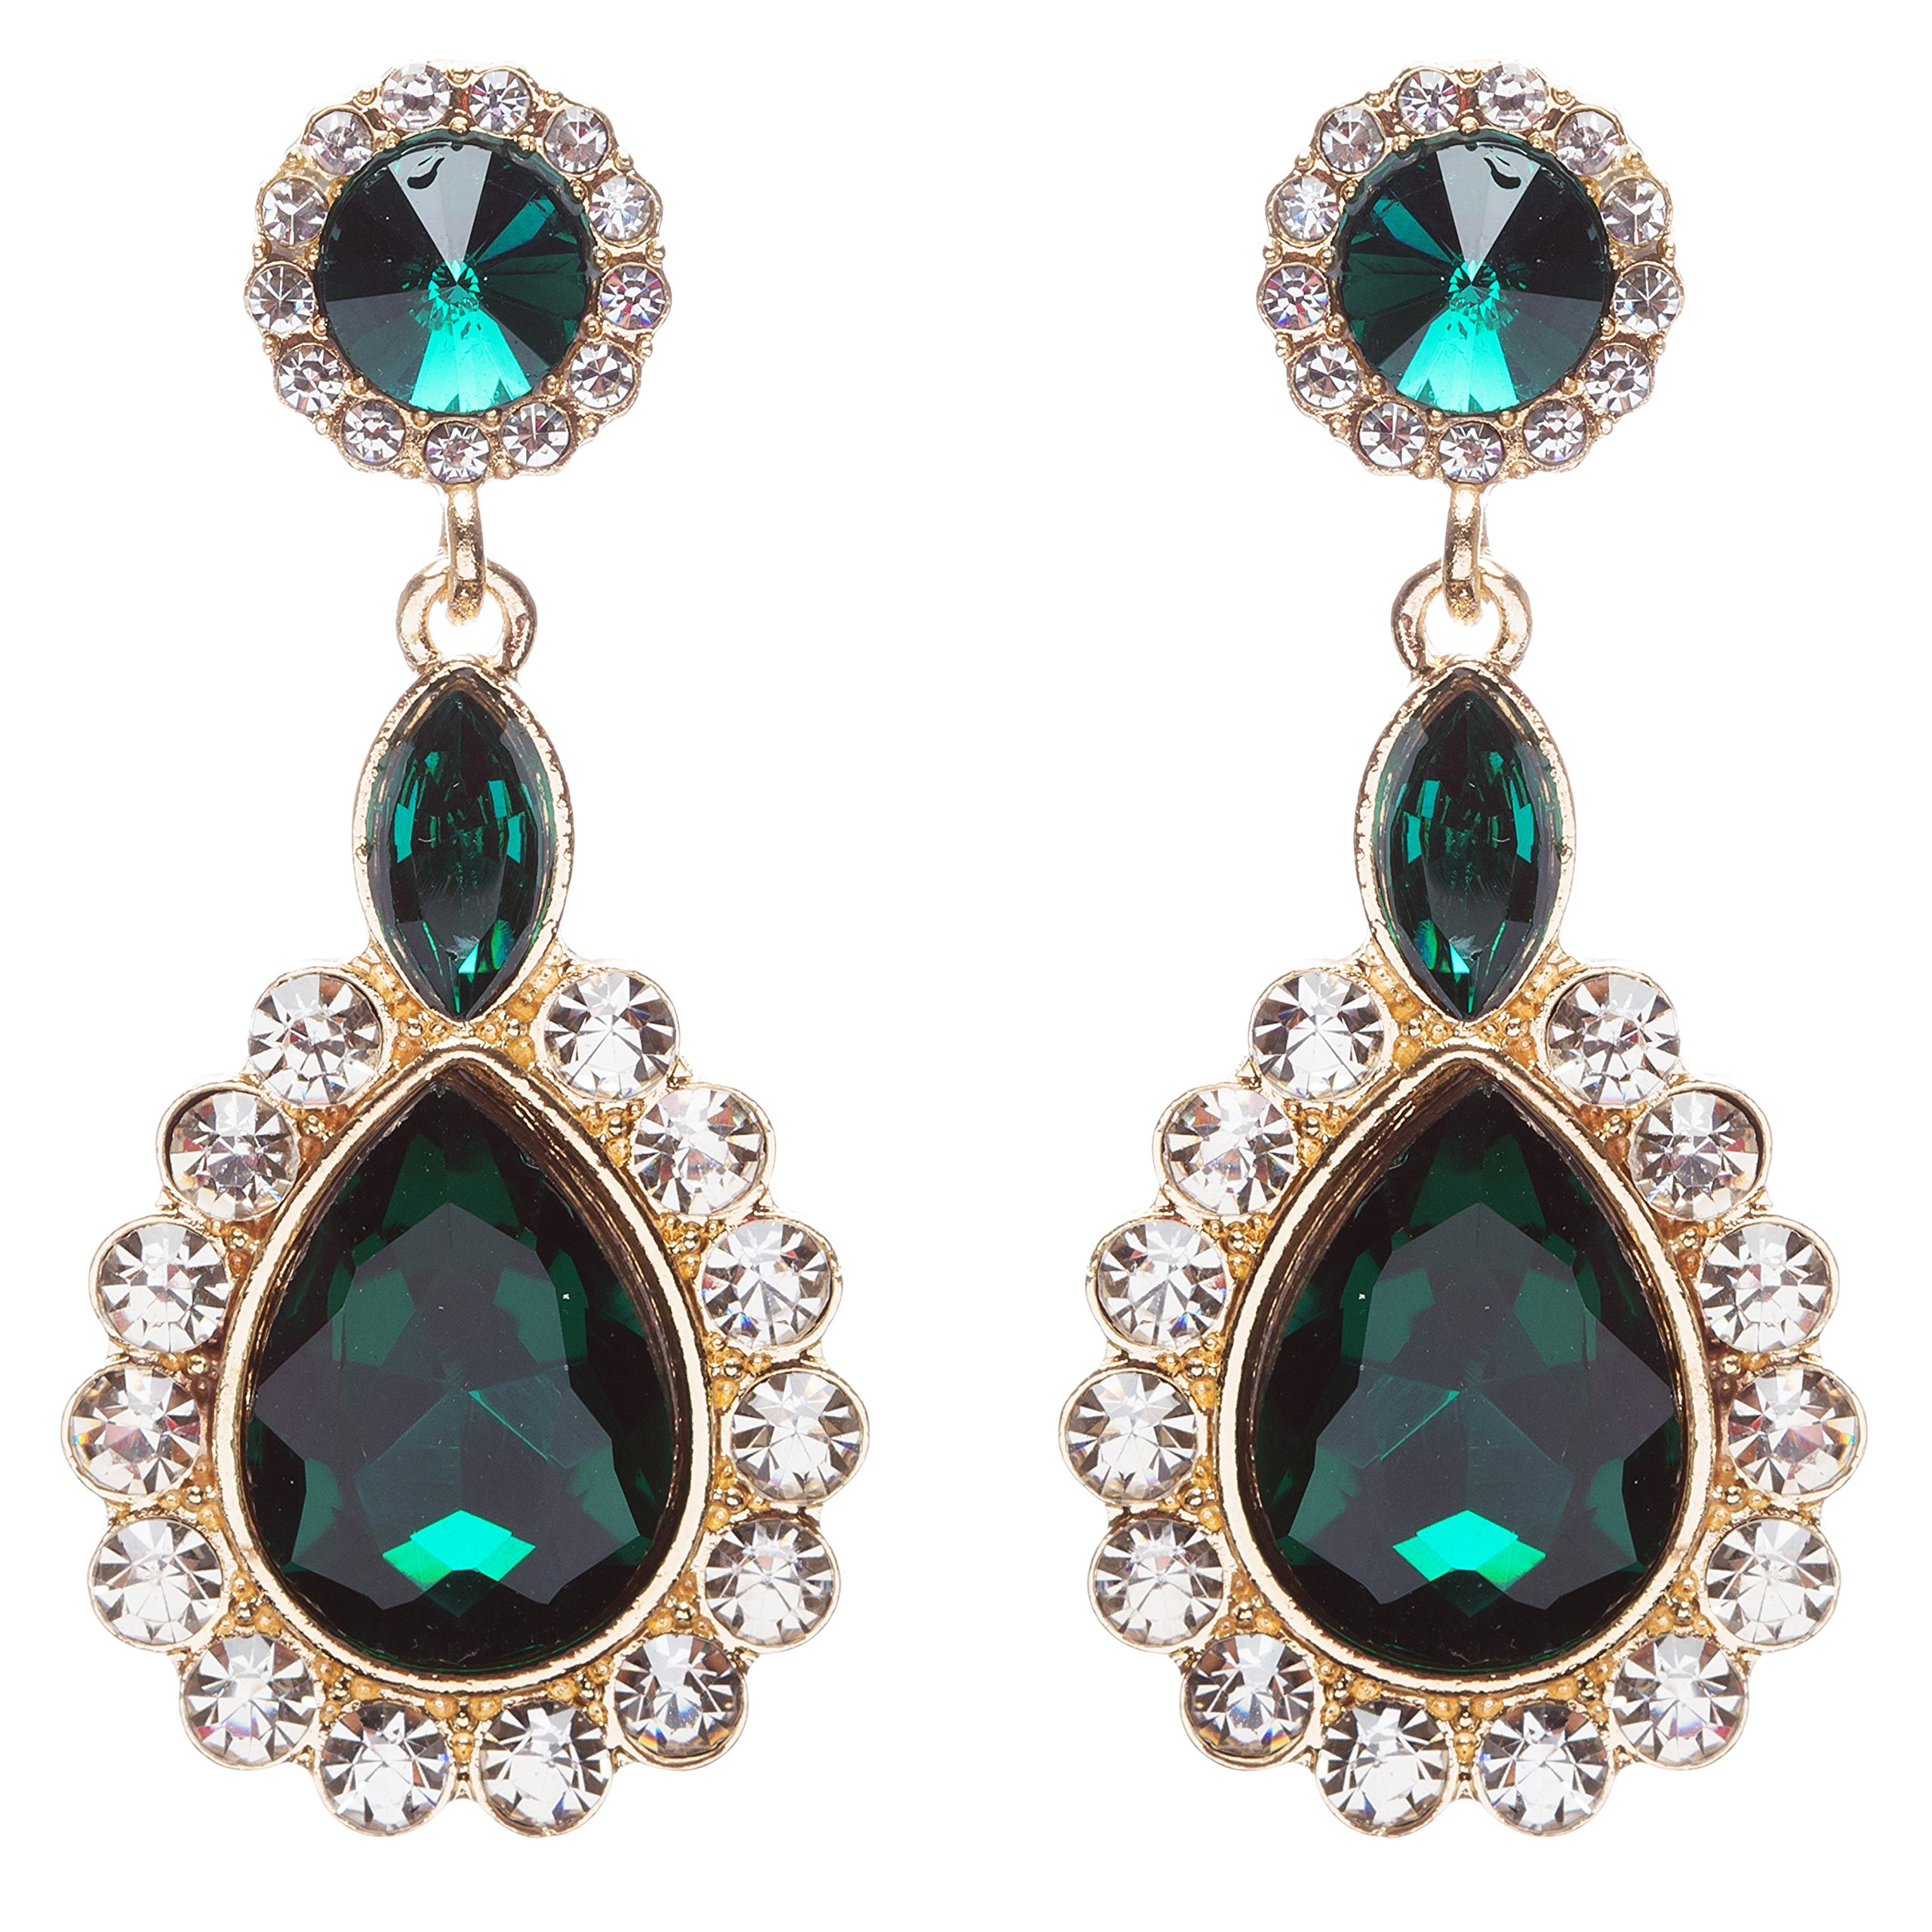 Beautiful Glamorous Bridal Crystal Rhinestone Teardrop Dangle Earrings Green